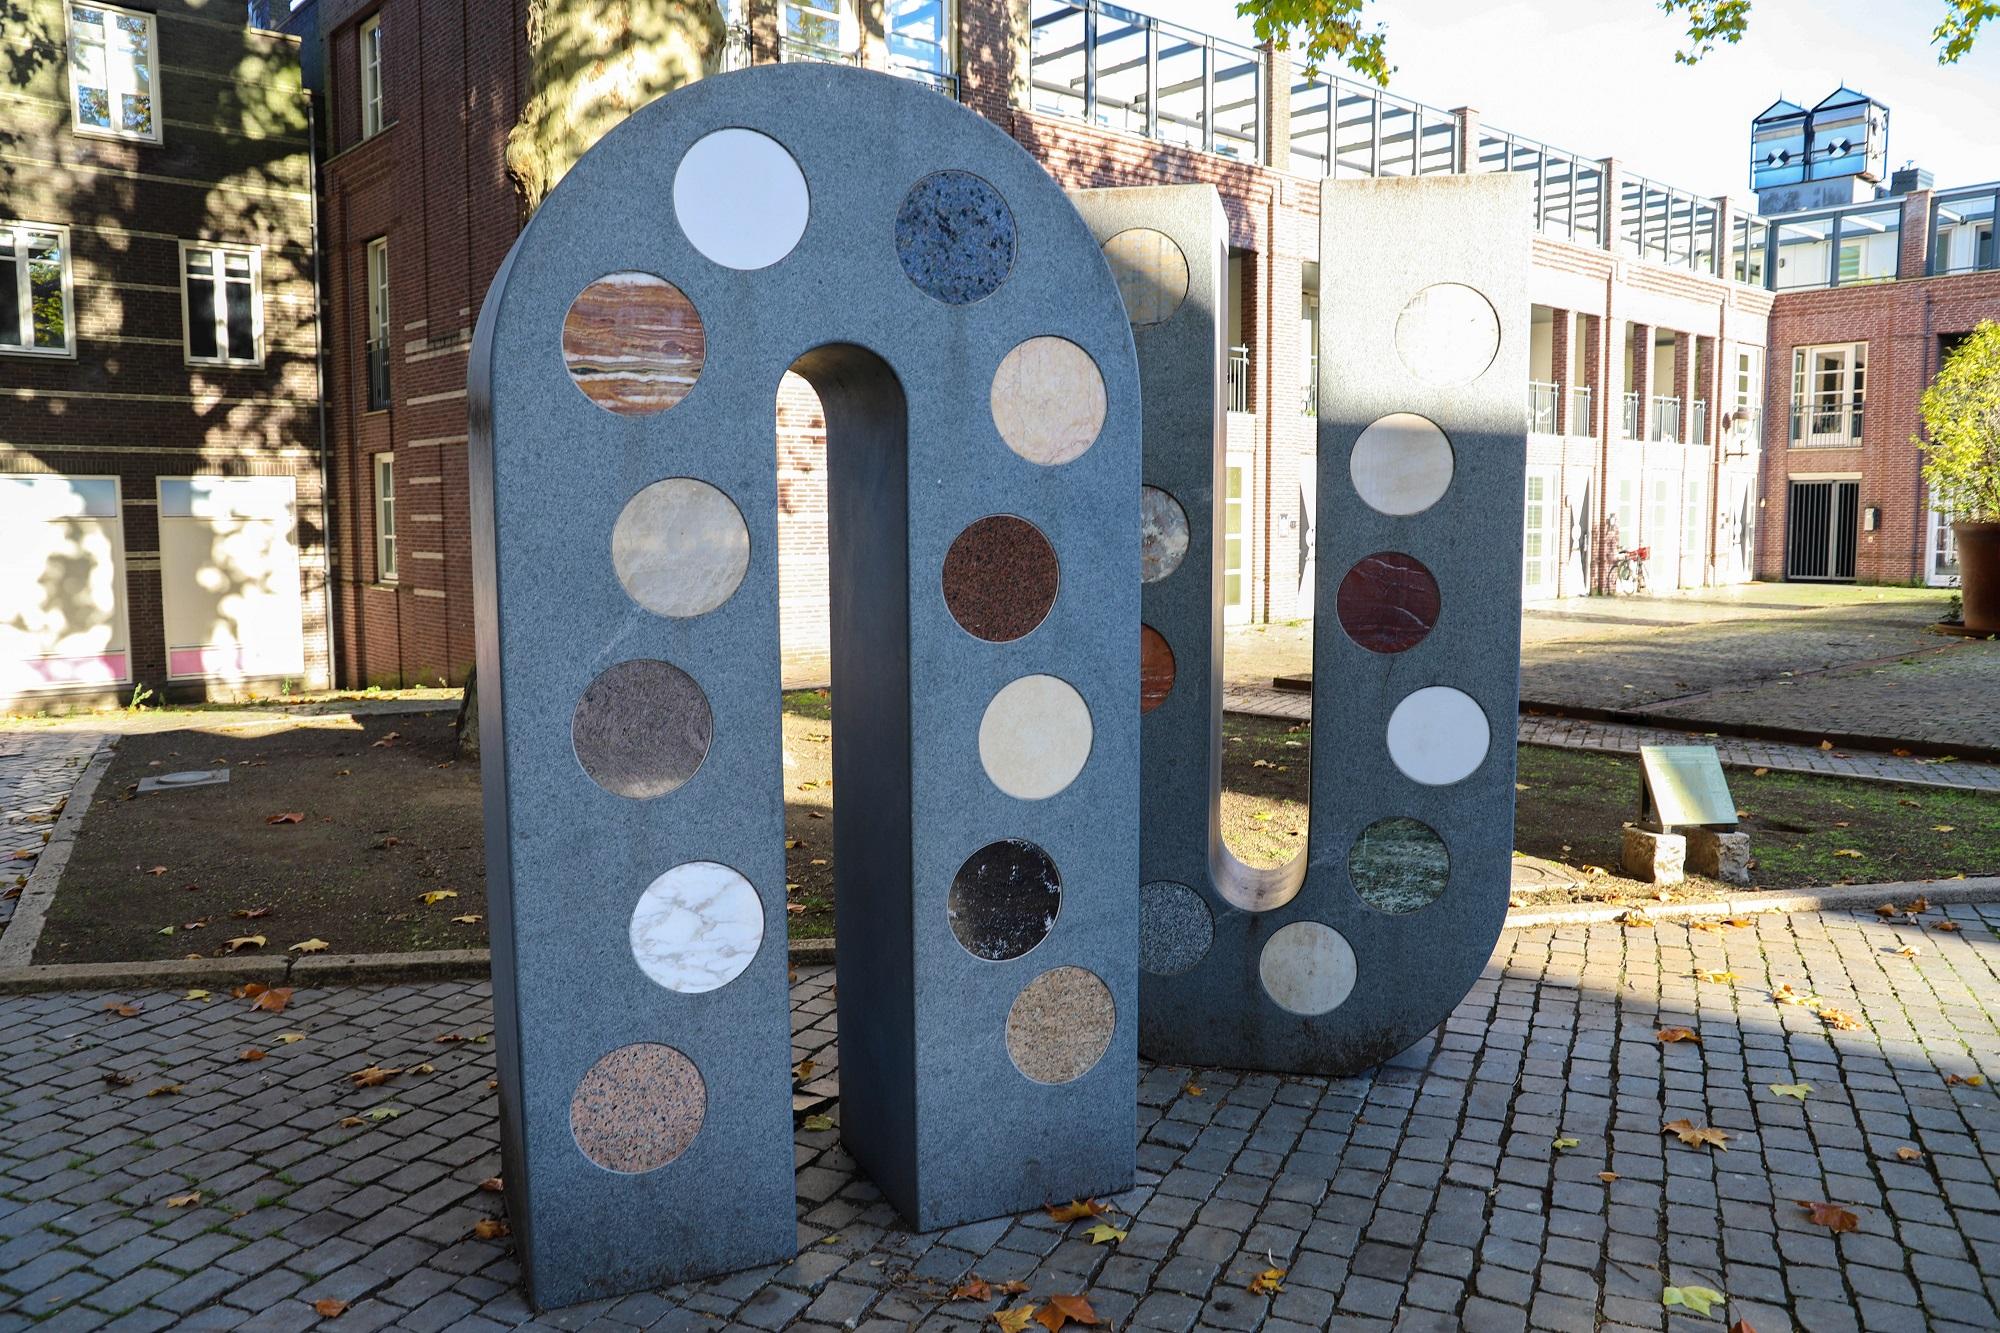 letters nu bergen op zoom kios stenen tuin thalia thaliaplein achter de peperbus sinter gertrudiskerk kunst kunstwerk nu